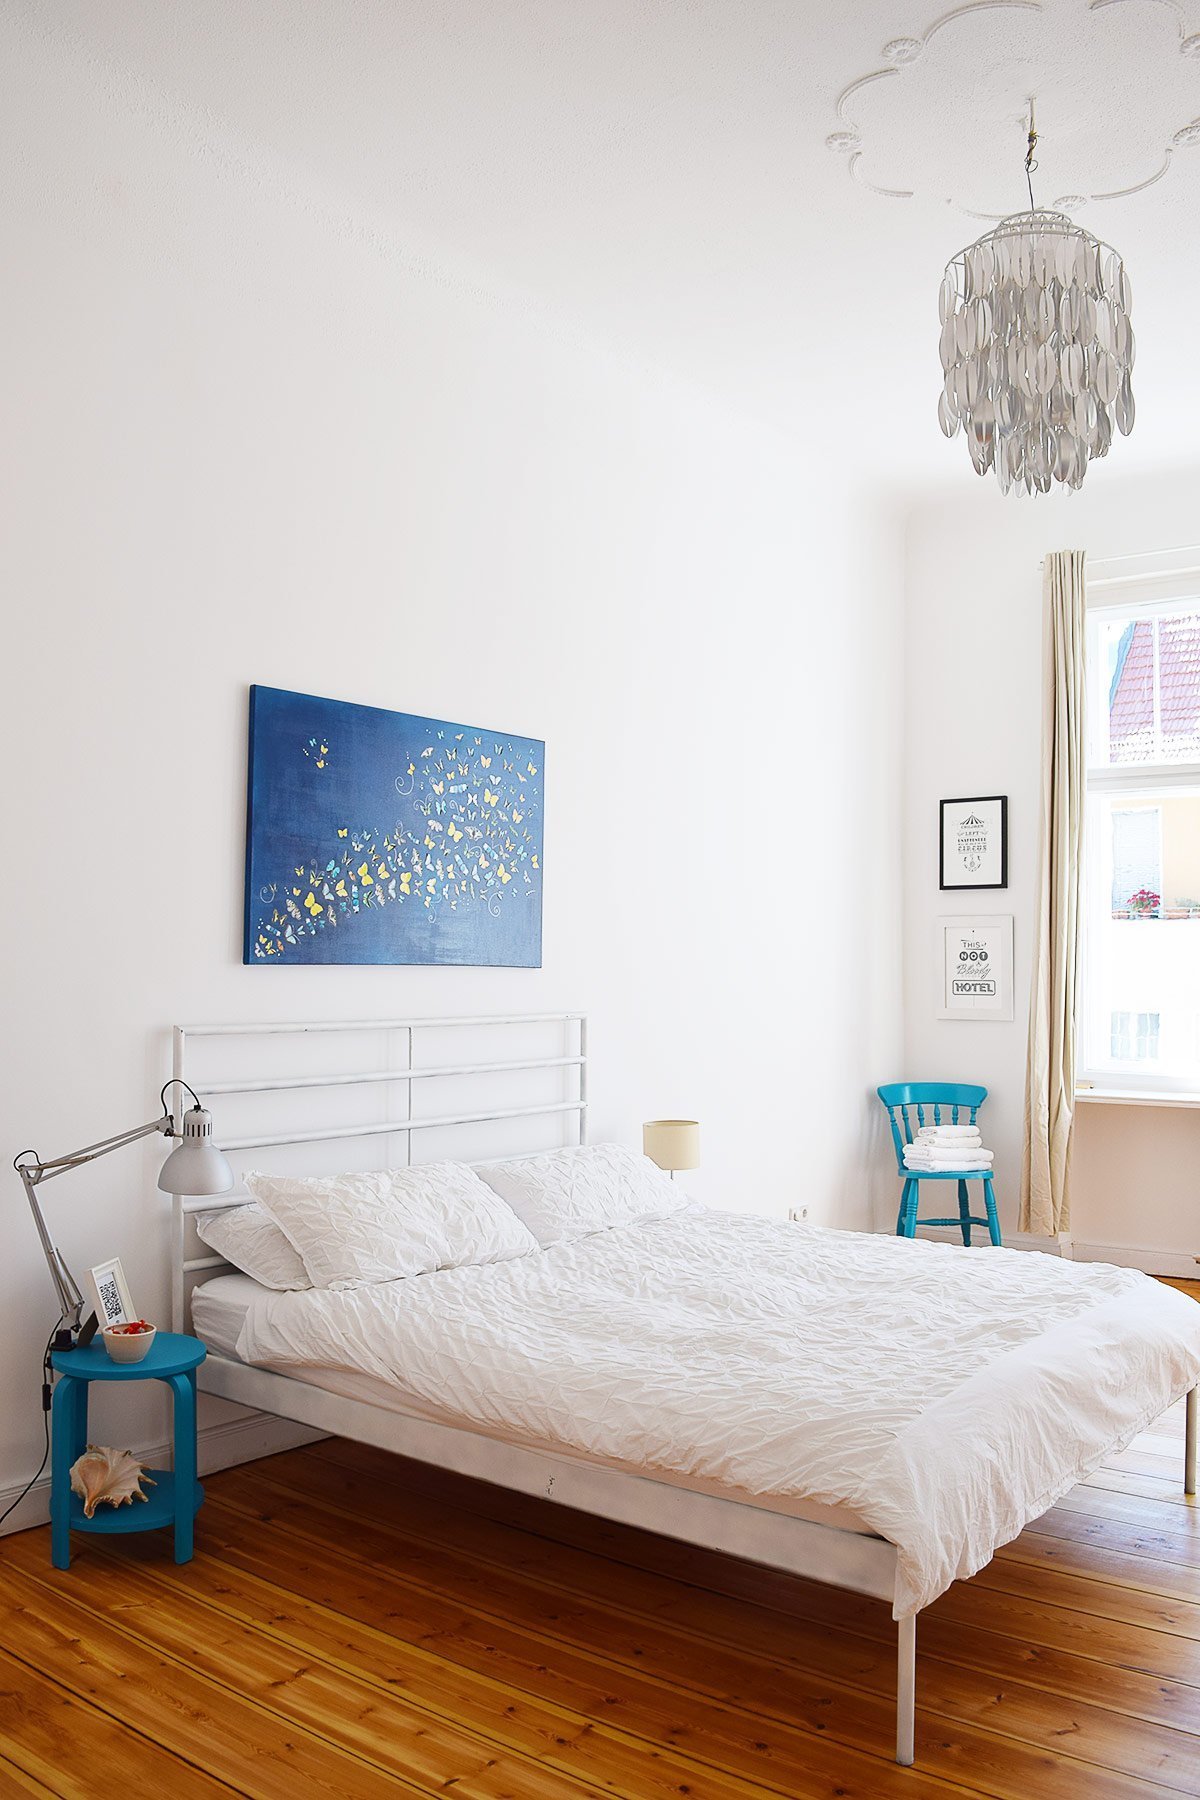 Guest Bedroom In Progress | Little House On The Corner